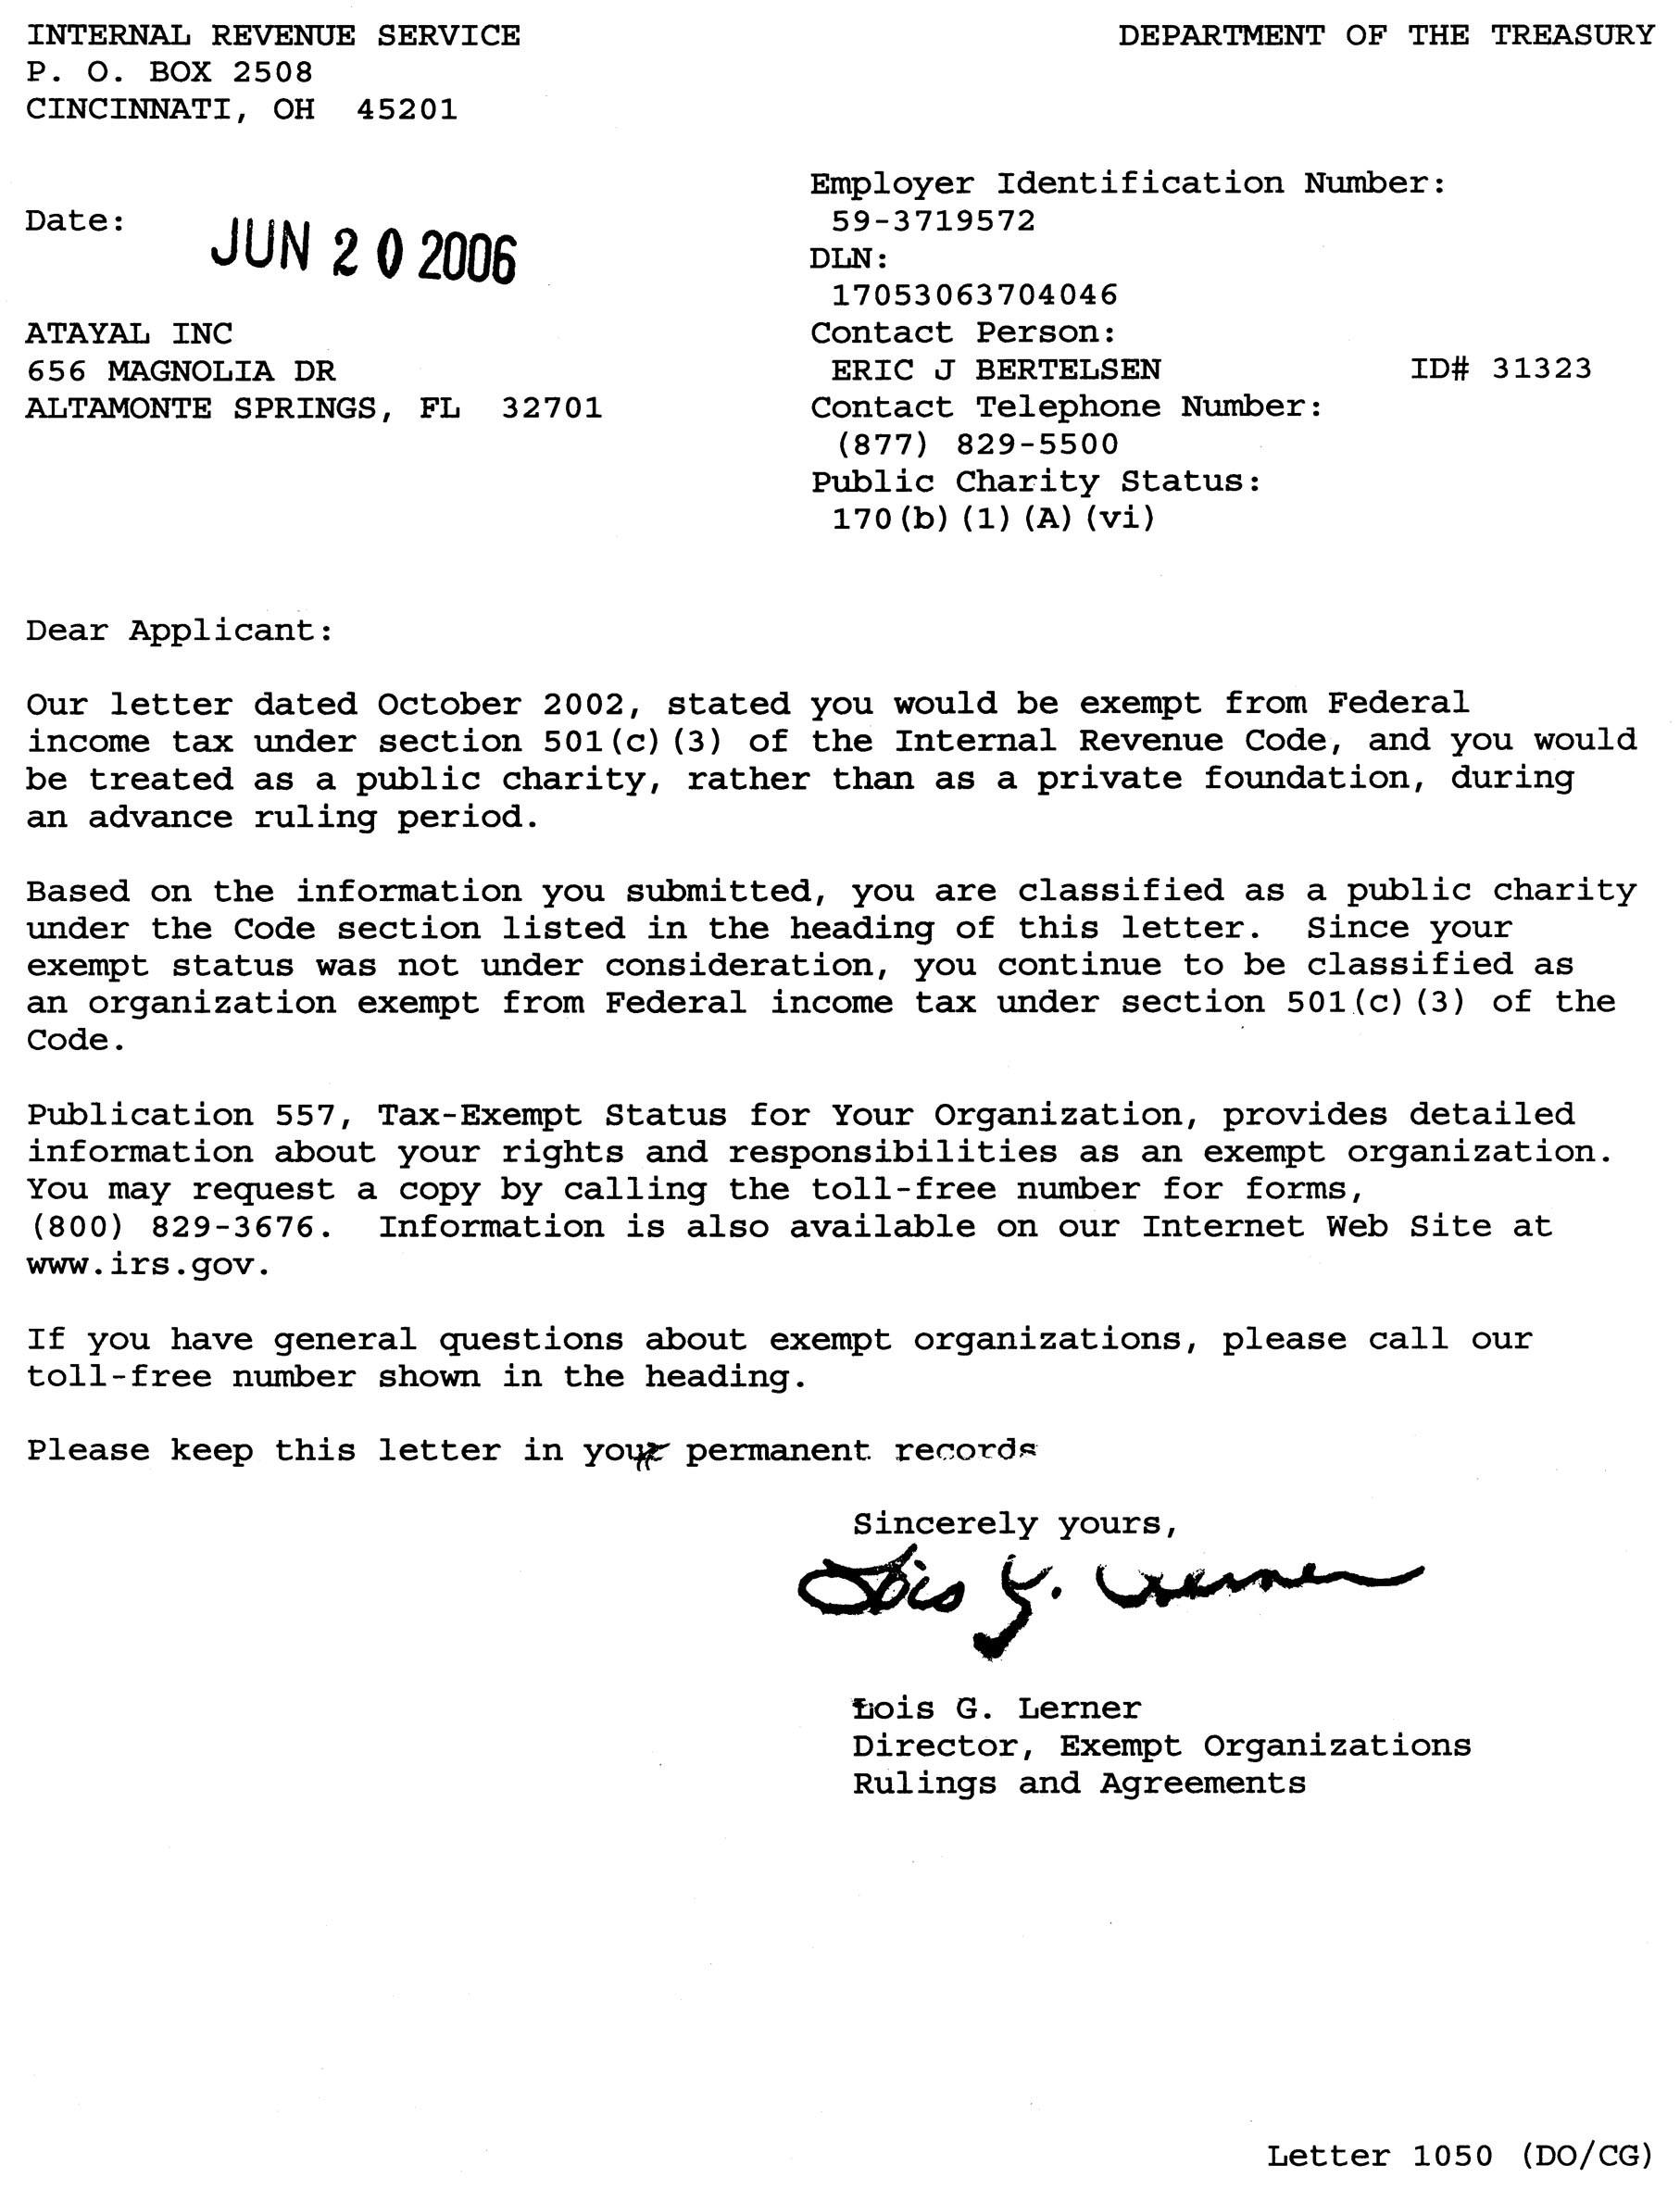 Non Profit Tax Deduction Letter Template - Sample 501c3 Donation Letter Fresh Great Tax Deductible Donation